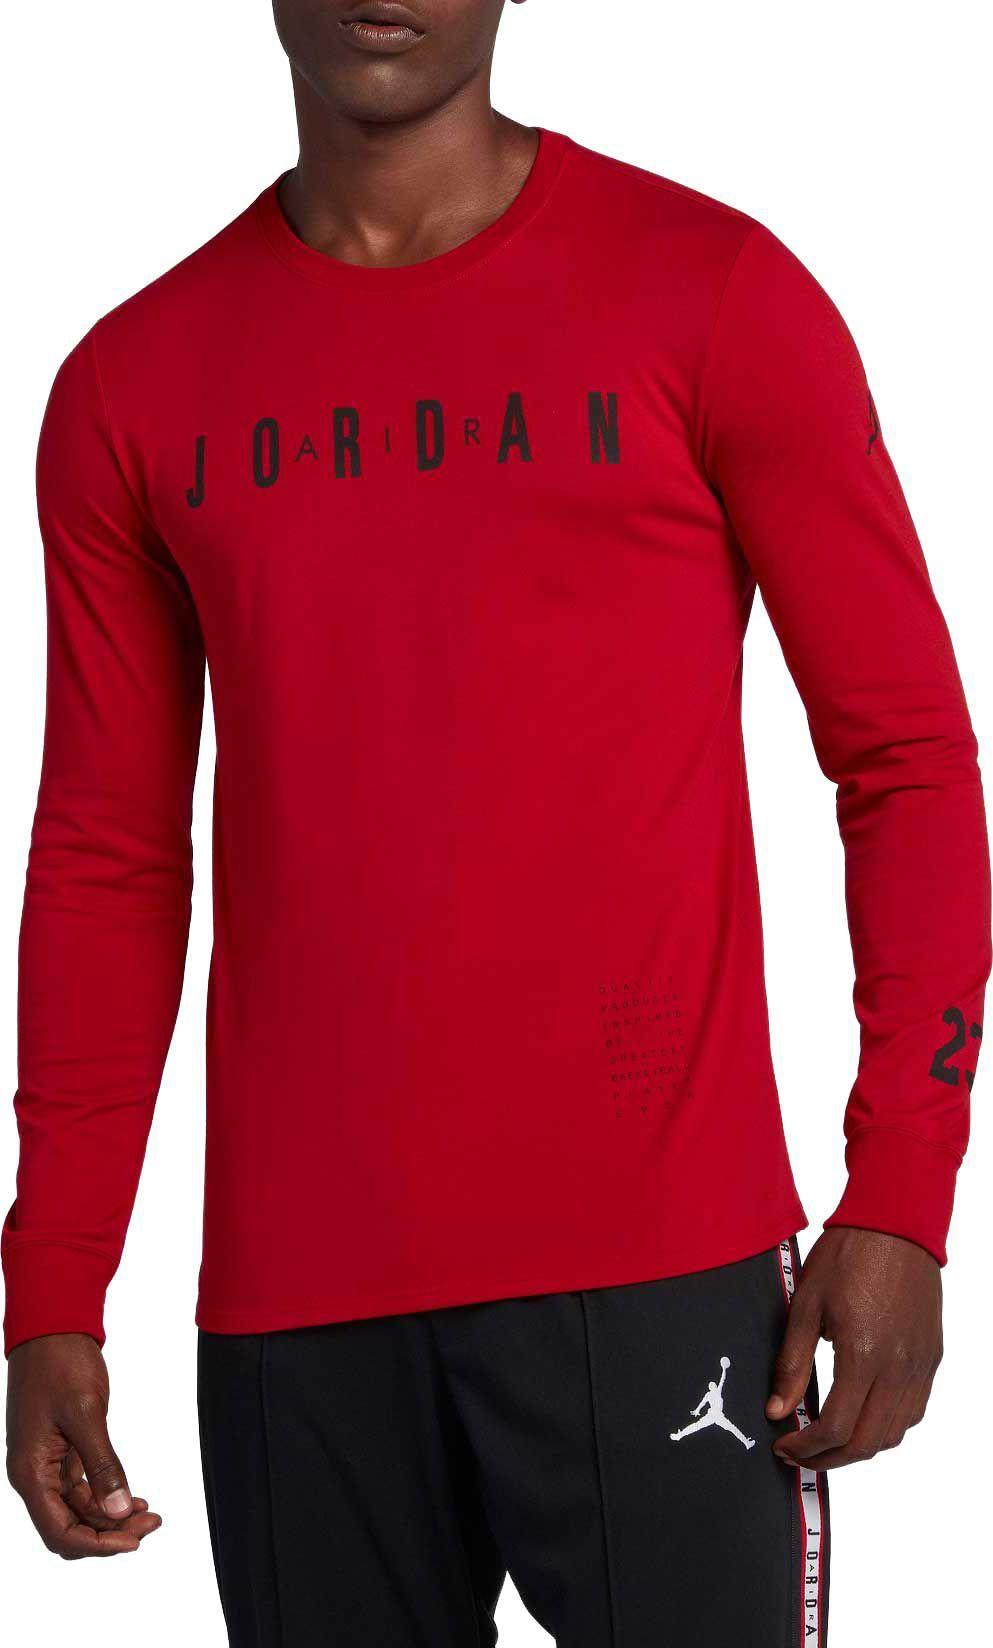 42ff411231e Jordan Men's Basketball Long Sleeve Graphic T-Shirt in 2019 ...